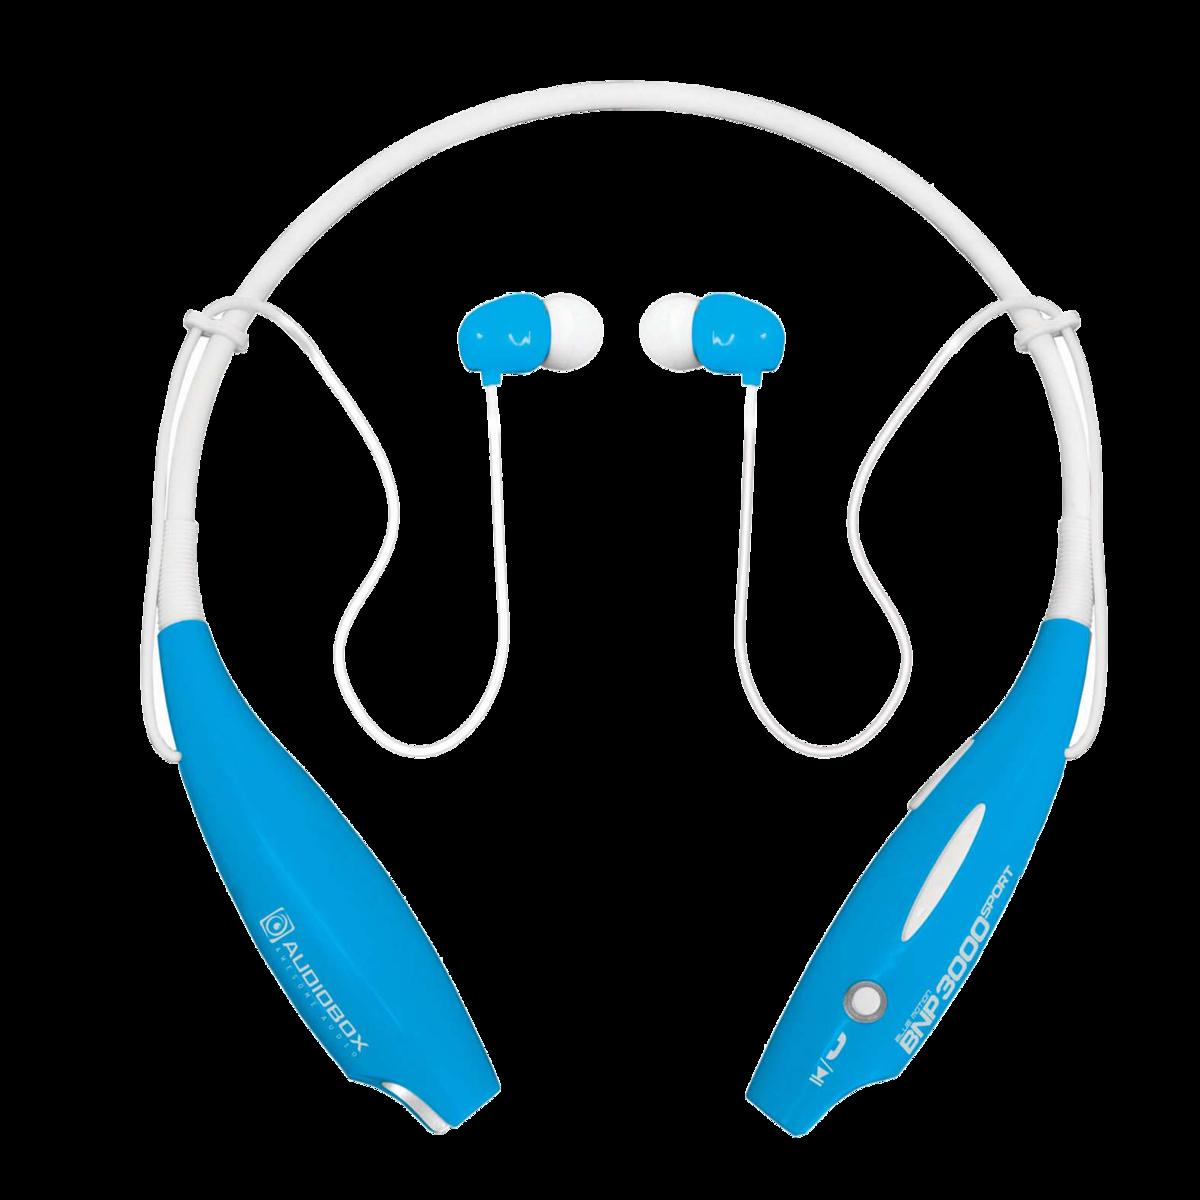 SONIC GEAR 舒適悠閒運動型藍牙耳機_白藍色